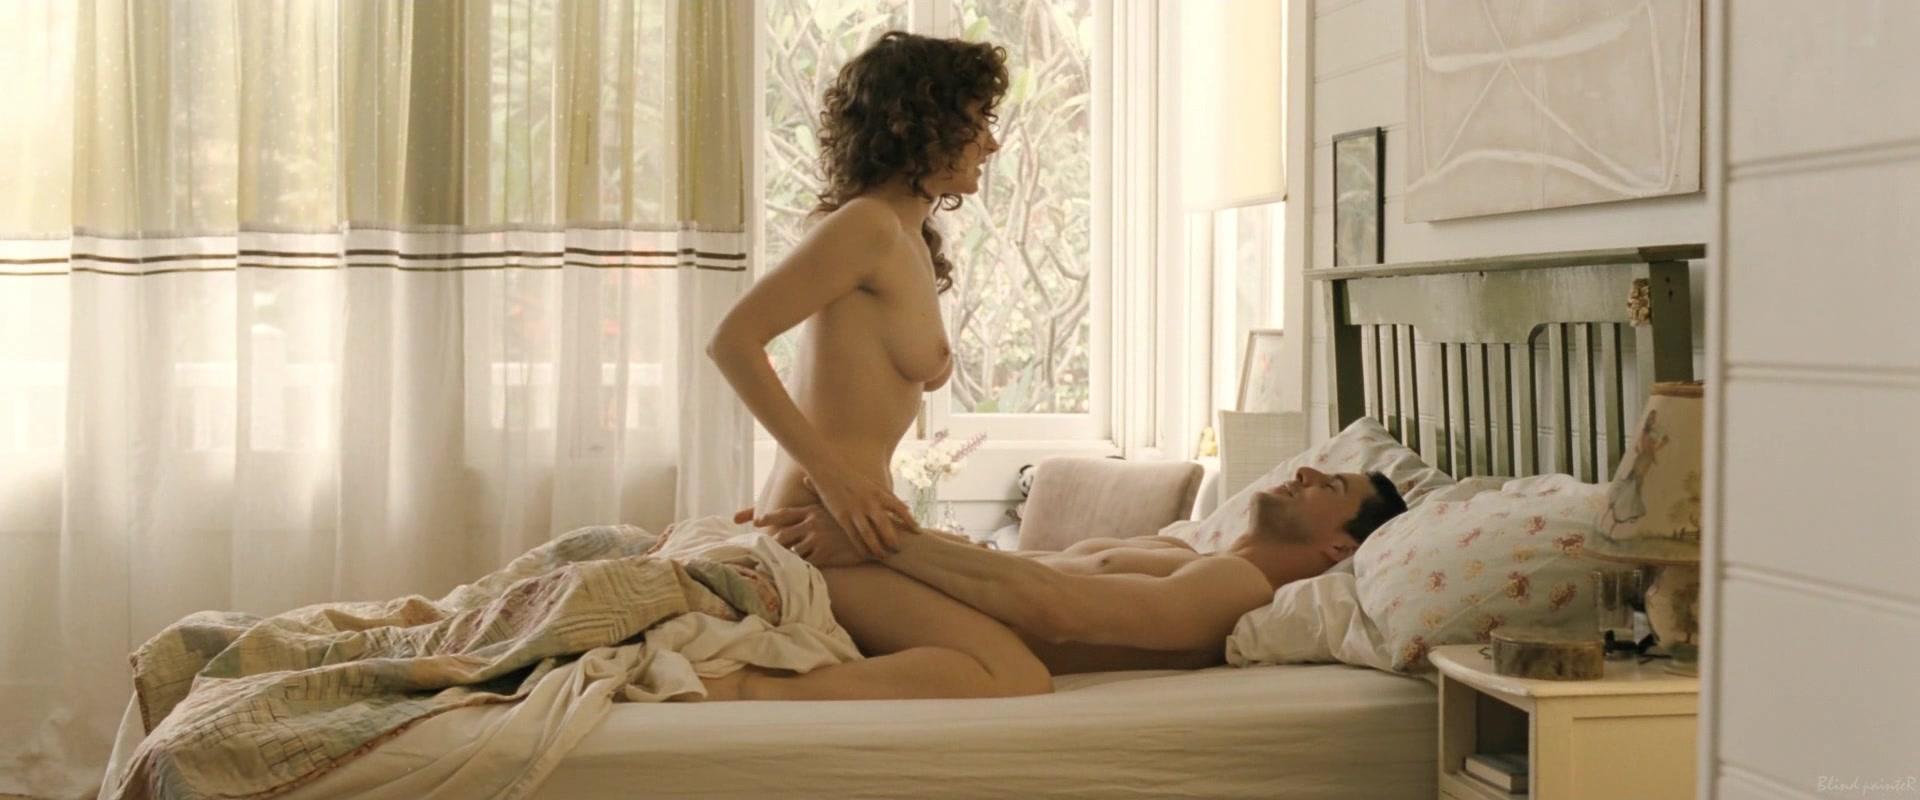 nude sex scene tumblr